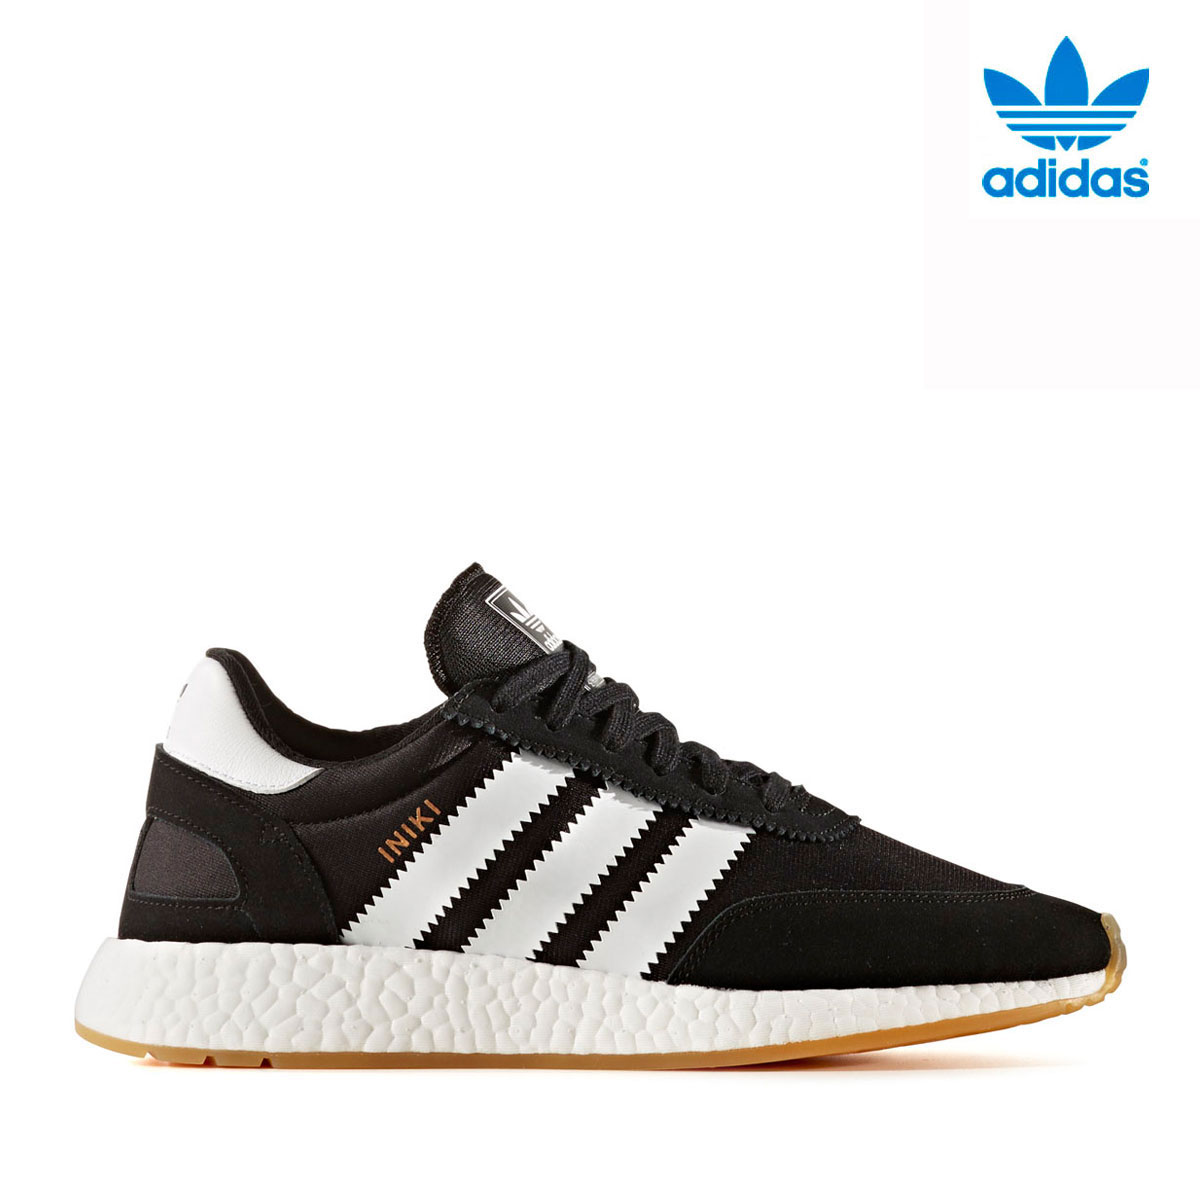 adidas Originals INIKIRUNNER (アディダス オリジナルス イニキランナー)CORE BLACK/RUNNING WHITE/GUM3【メンズ スニーカー】17FW-I